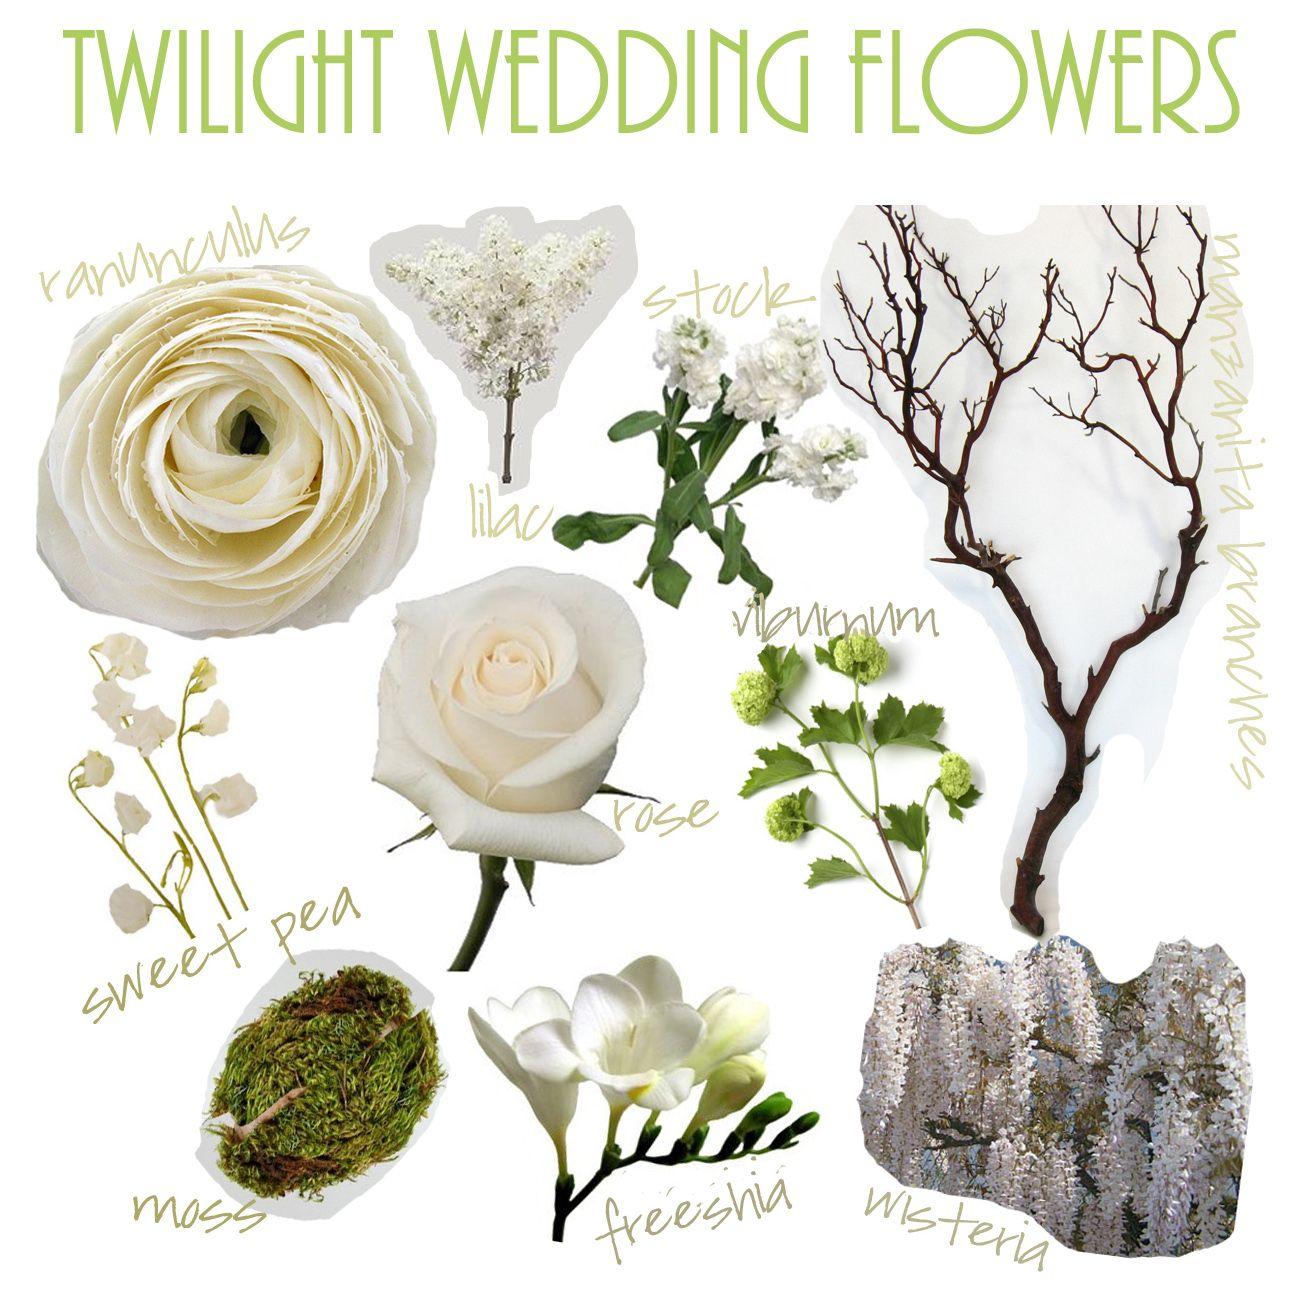 Twilight Wedding Quotes: Flores Del Sol: Twilight Wedding Flowers